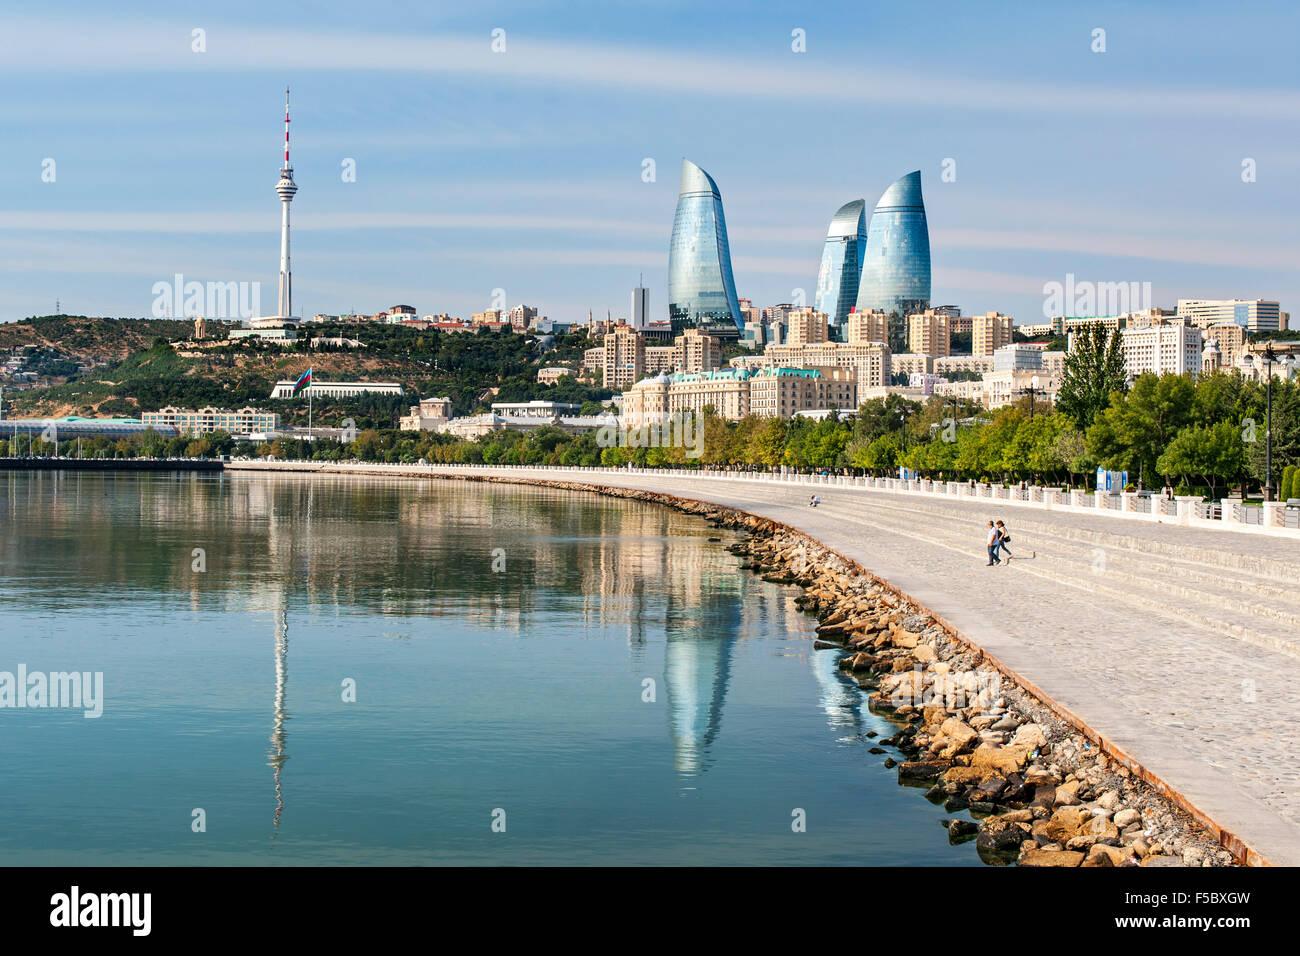 Baku Bay and the Baku skyline and promenade. - Stock Image